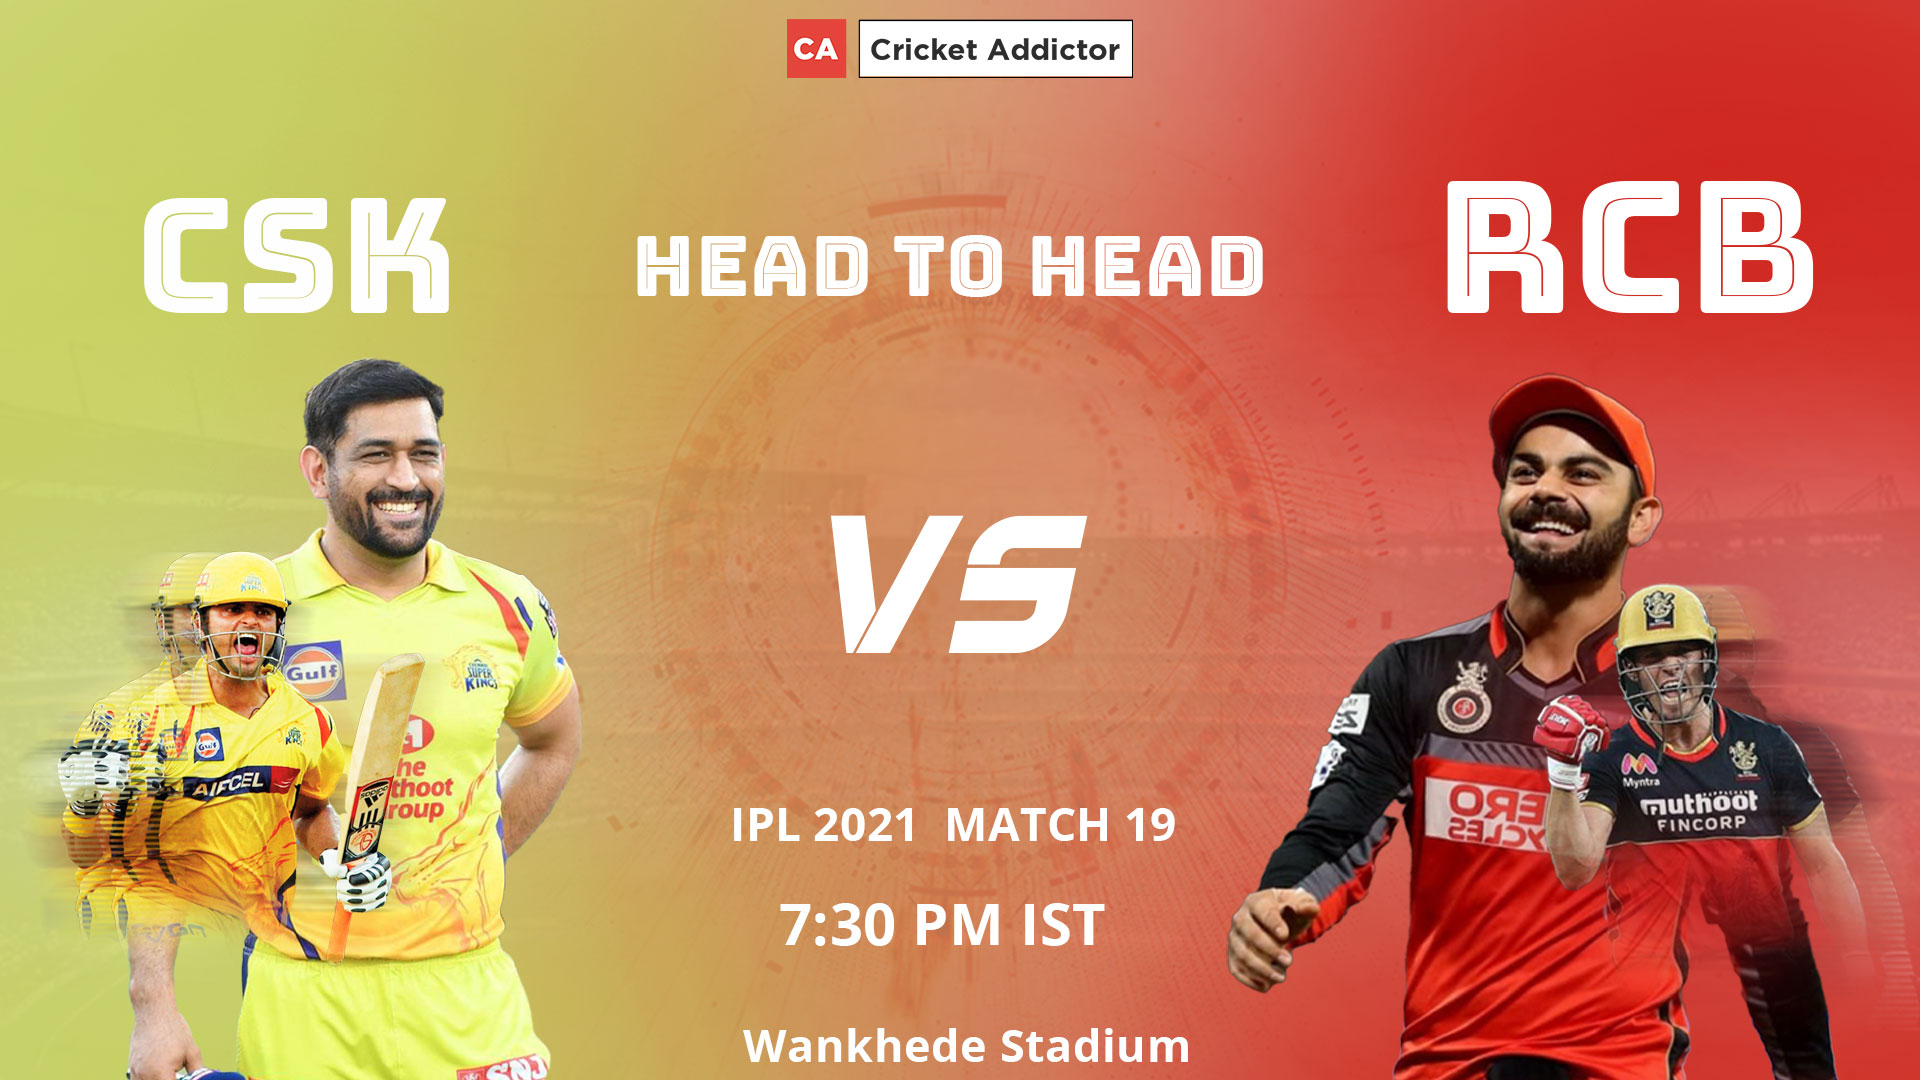 Royal Challengers Bangalore, Chennai Super Kings, CSK, RCB, CSK vs RCB, IPL 2021, Head-to-Head